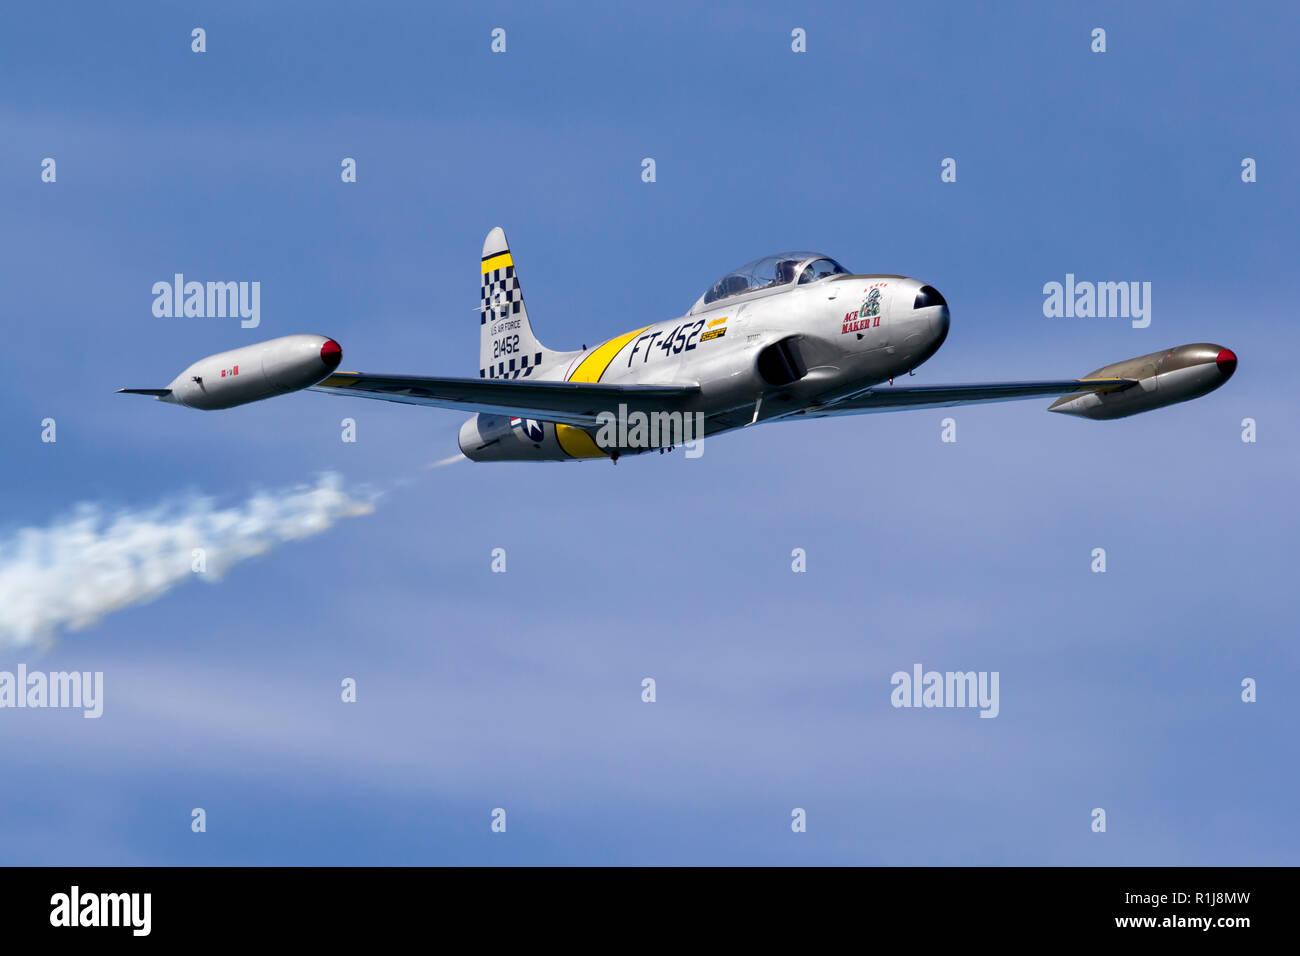 Greg Colyer pilots his Canadair CT-133 Shooting Star during the 2018 San Francisco Fleet Week air show. The Canadair CT-133 Shooting Star was develope - Stock Image